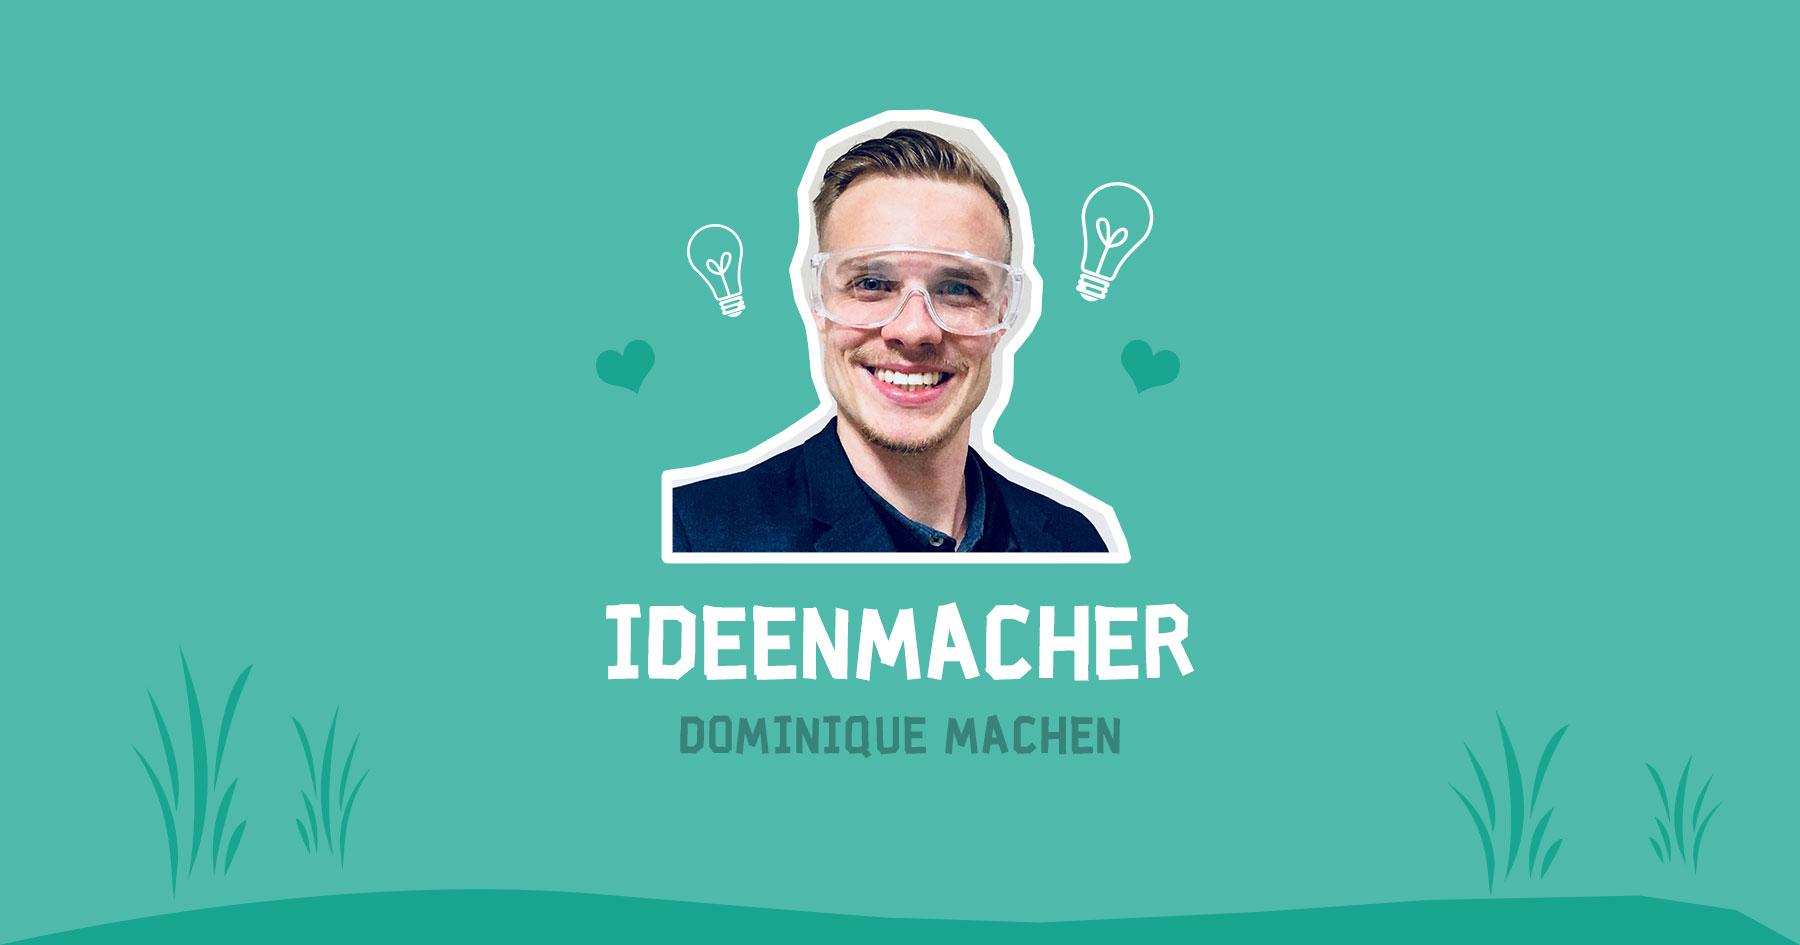 ideenmacher_willkommen_neu